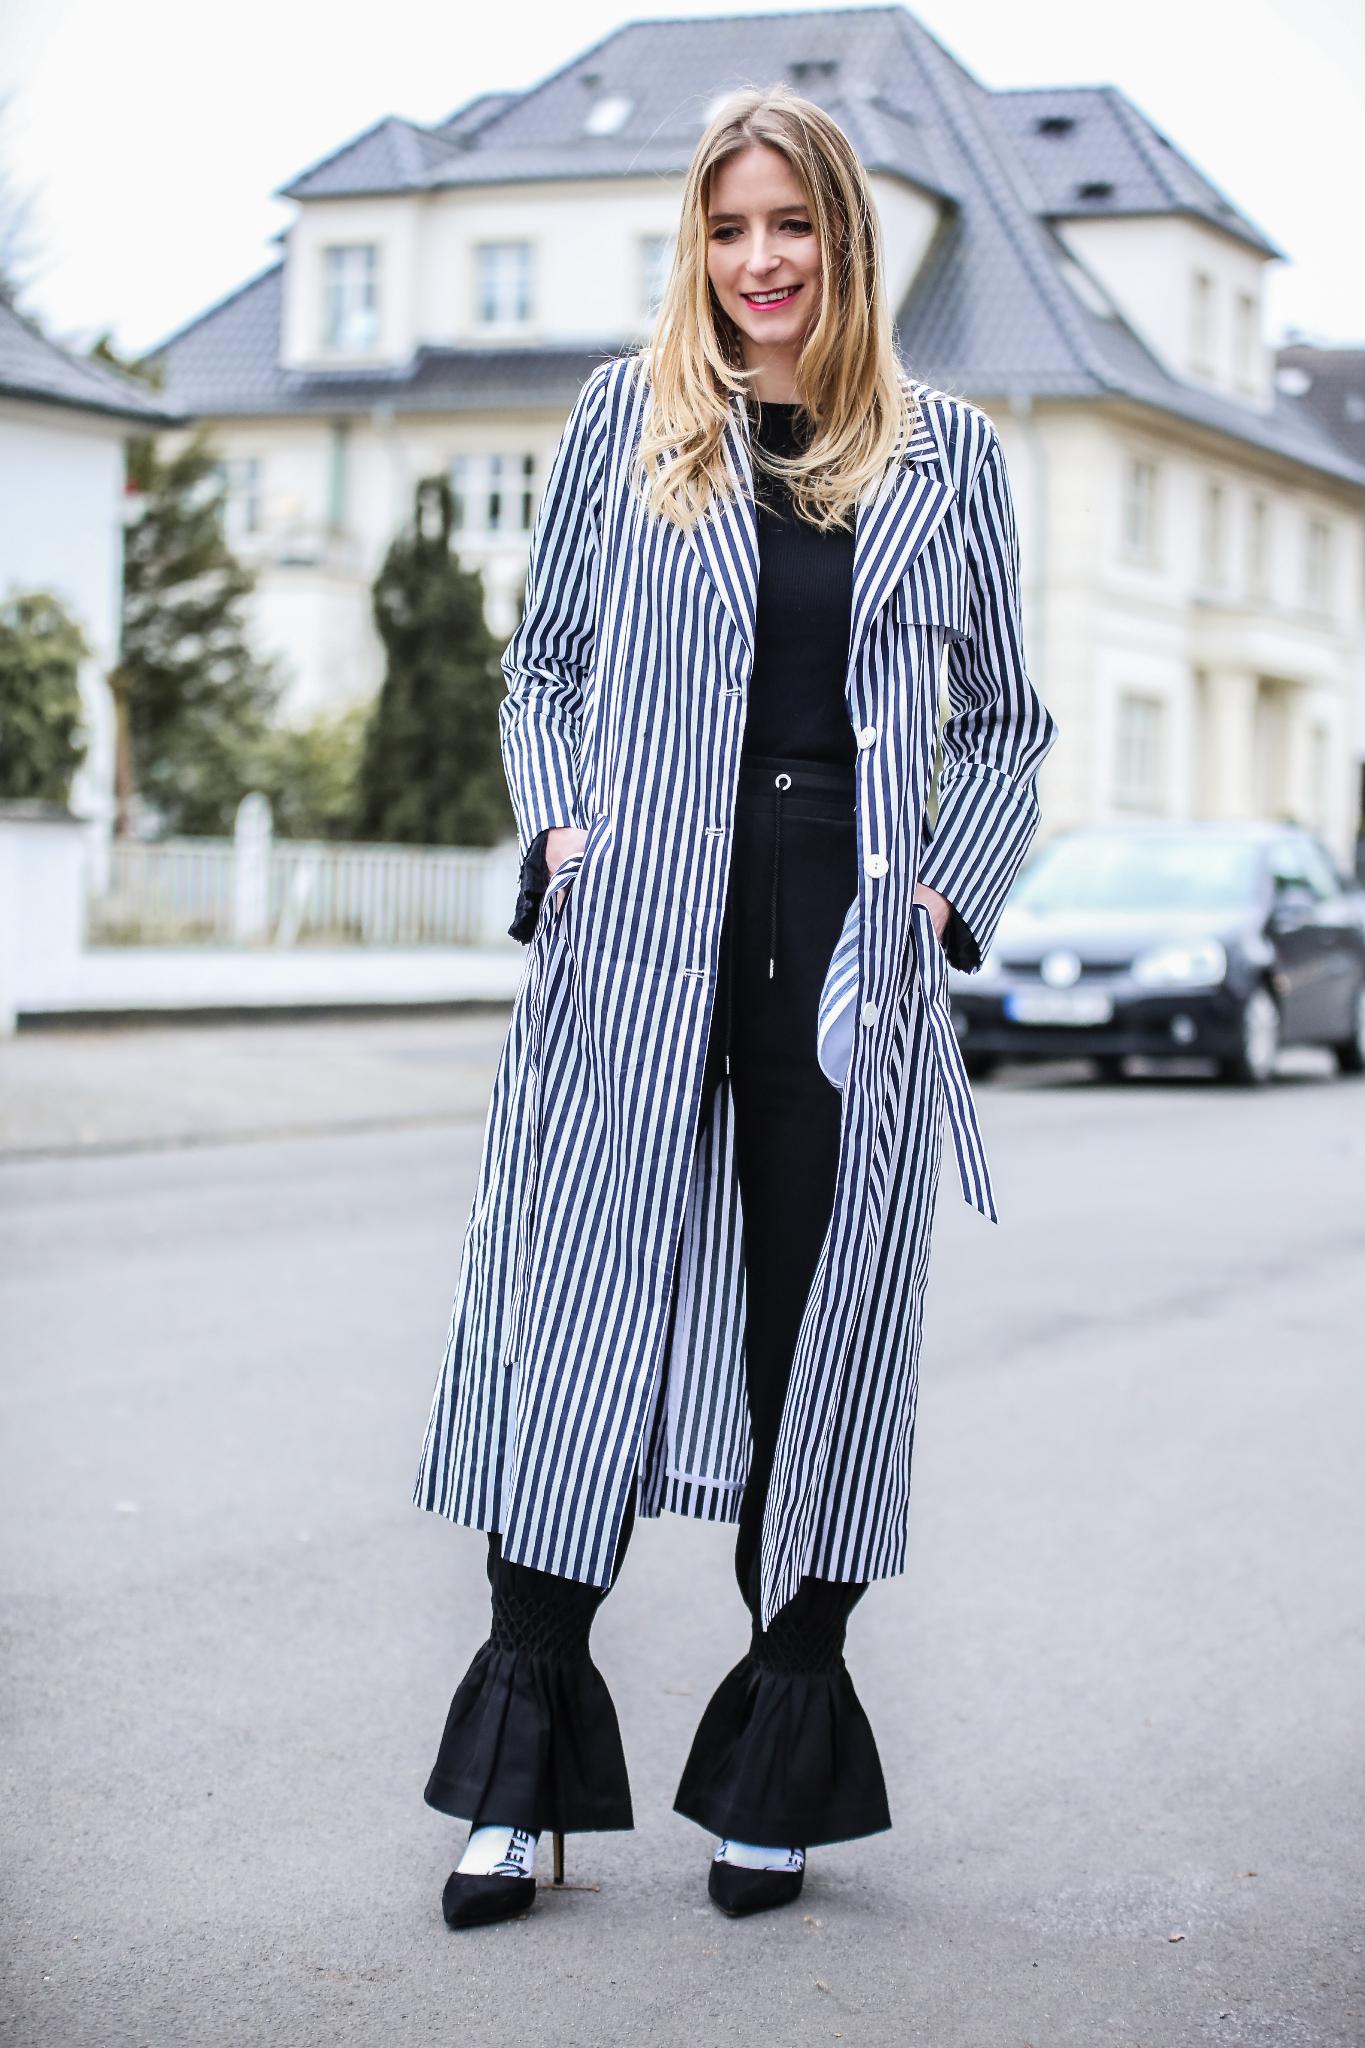 MOD-by-Monique-Fashion-Looks-Striped-Coat-Big-Volants-25